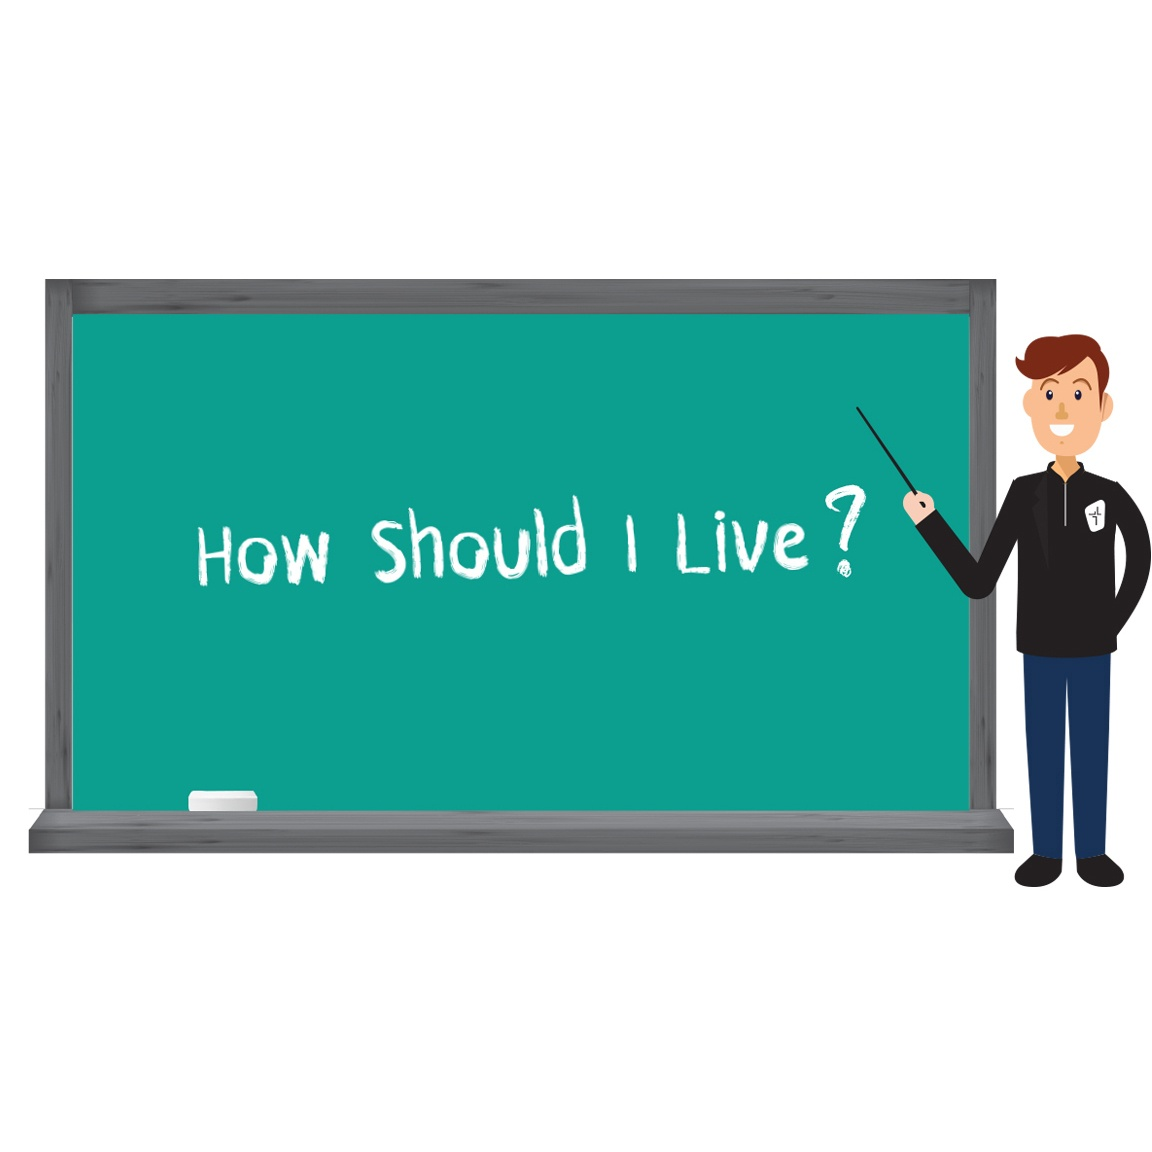 How Should I Live